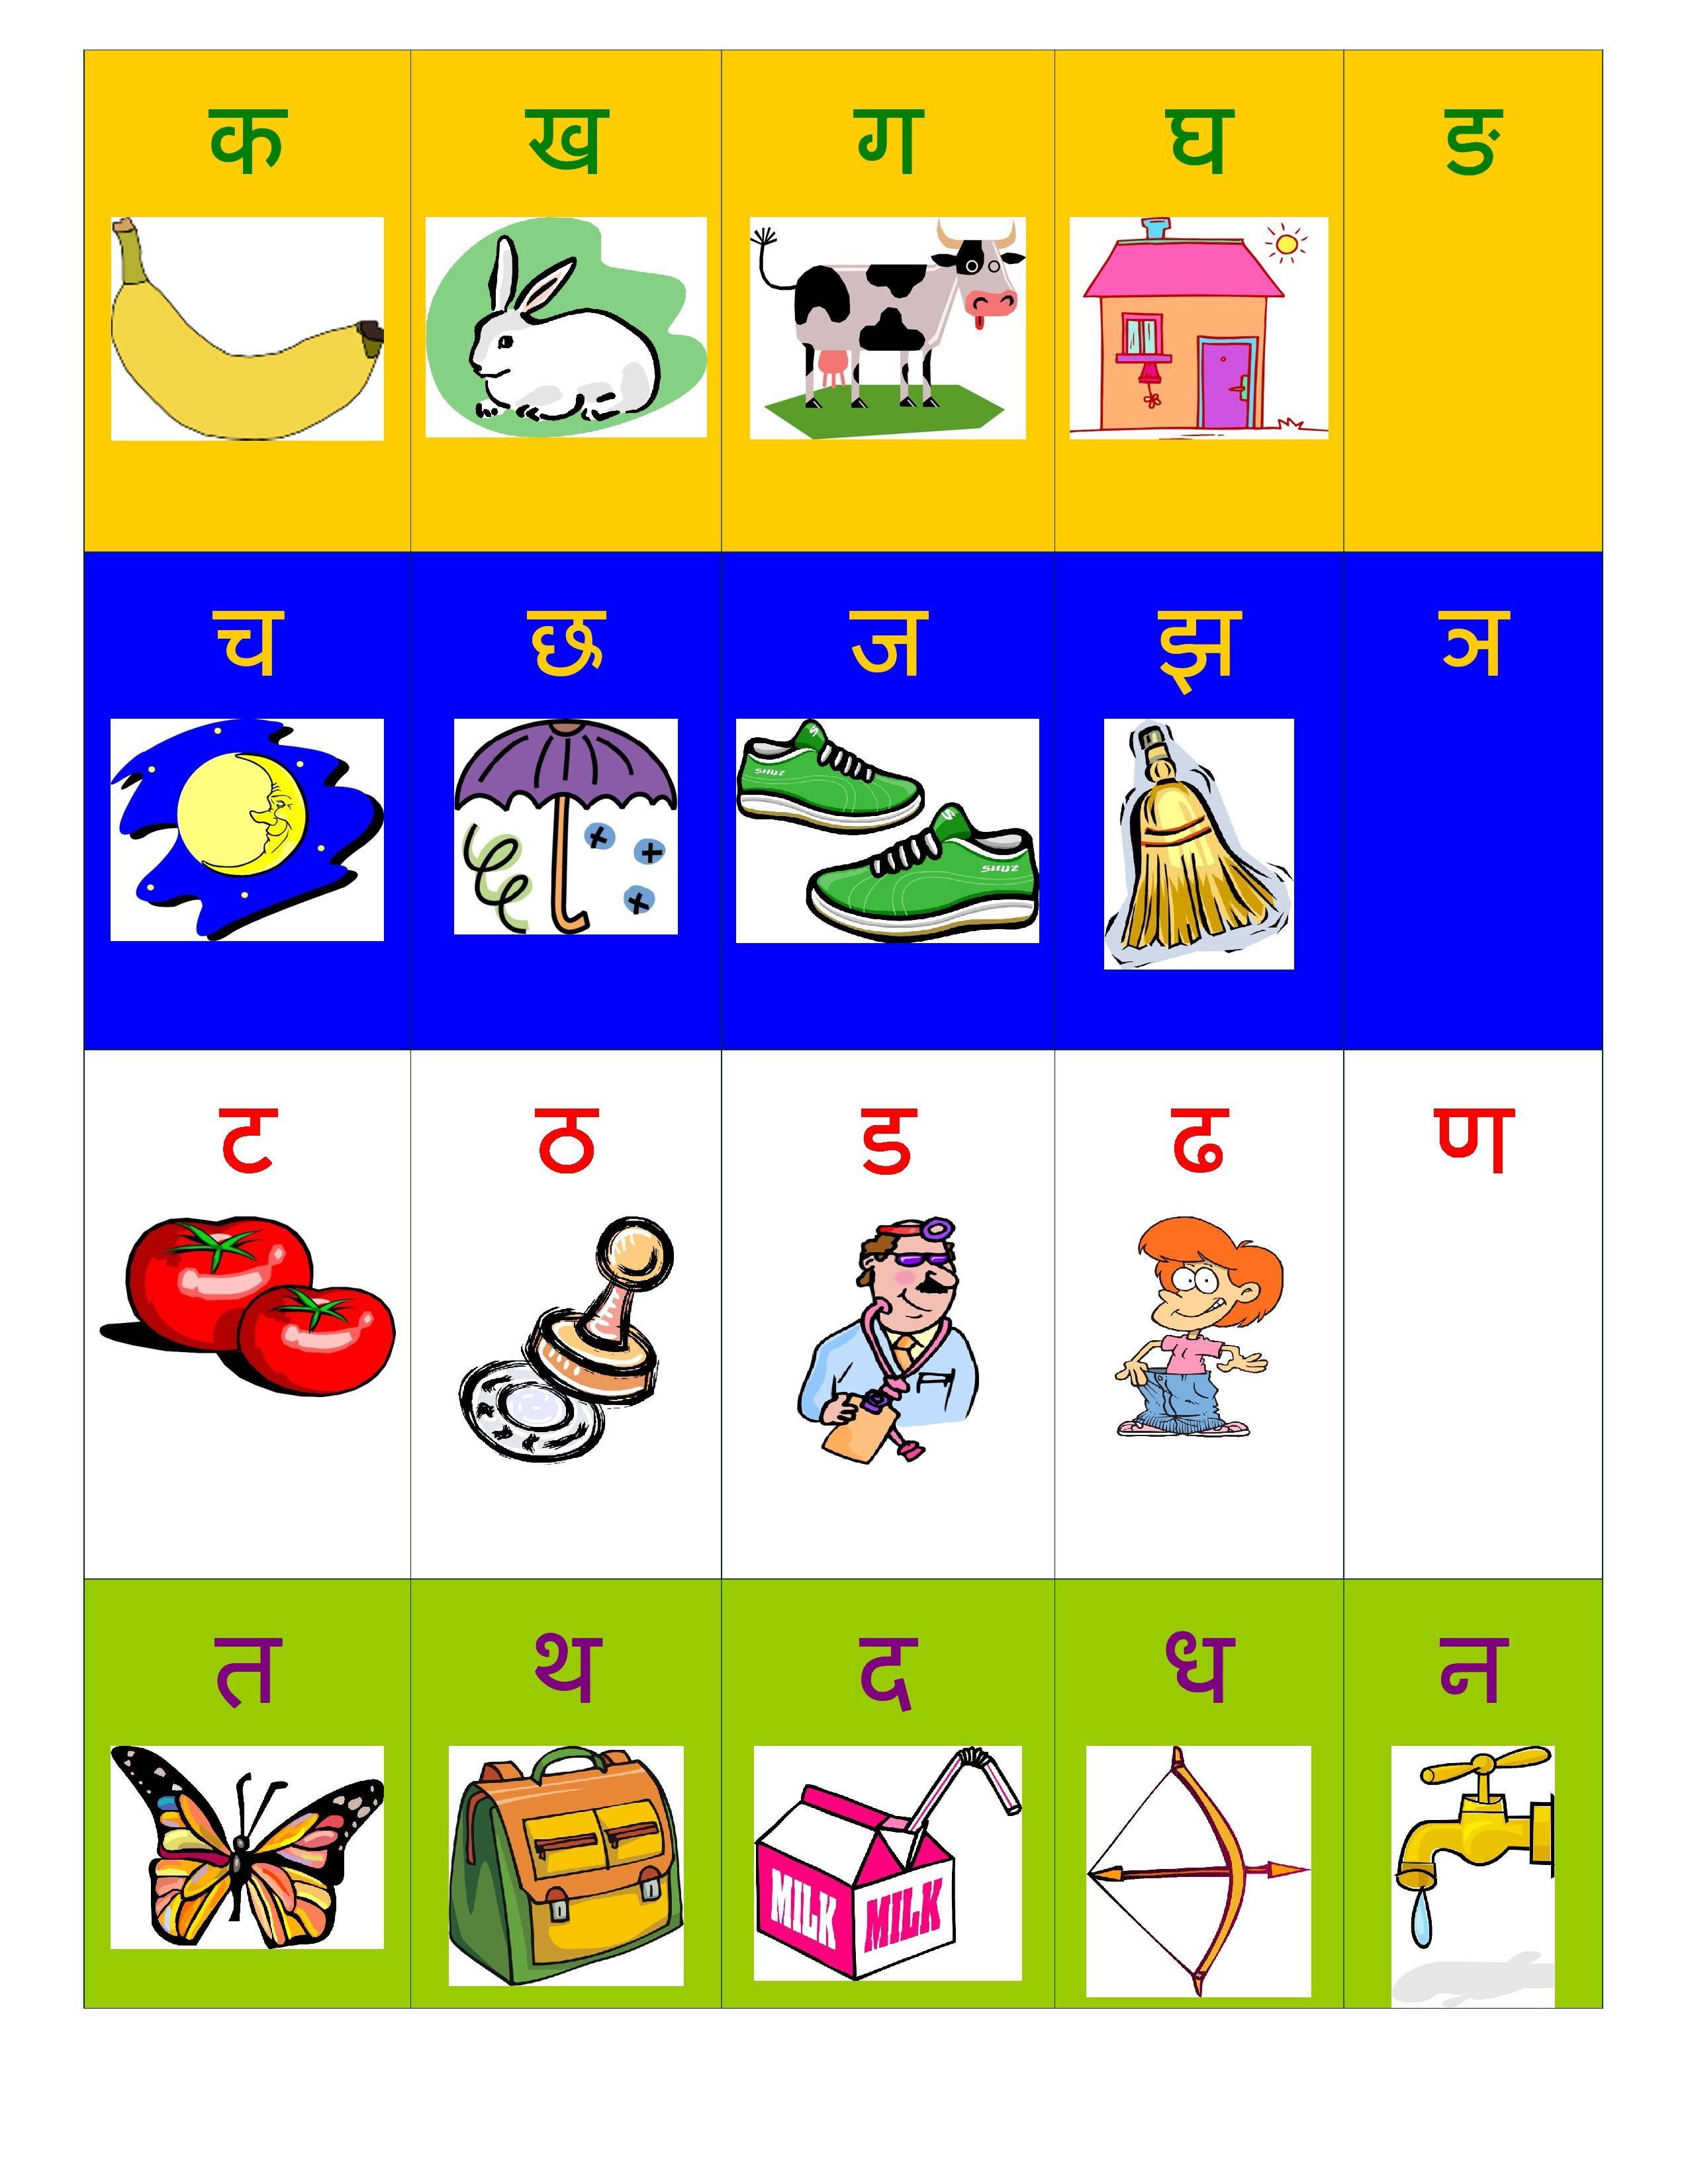 Hindi Alphabet Varnamala Chart Free Print At Home